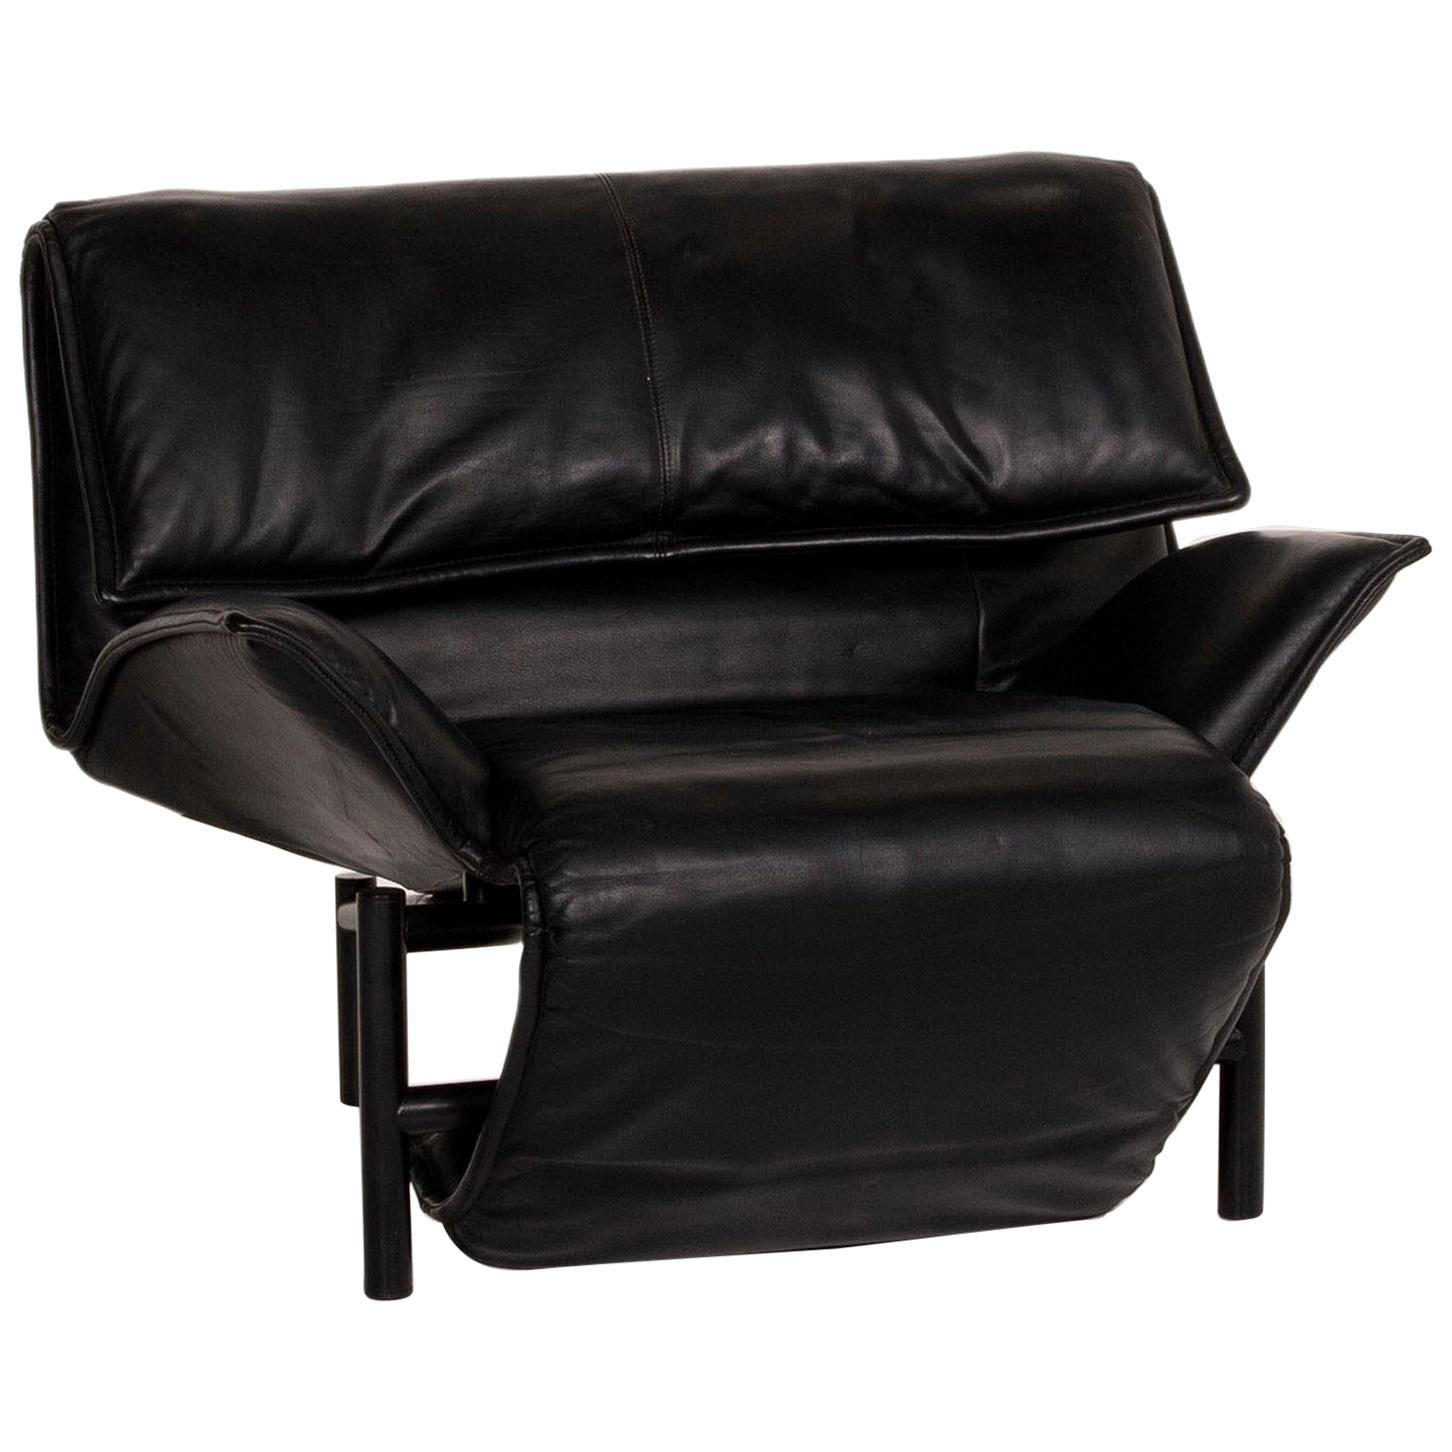 Cassina Veranda Leather Armchair Black Relax Function